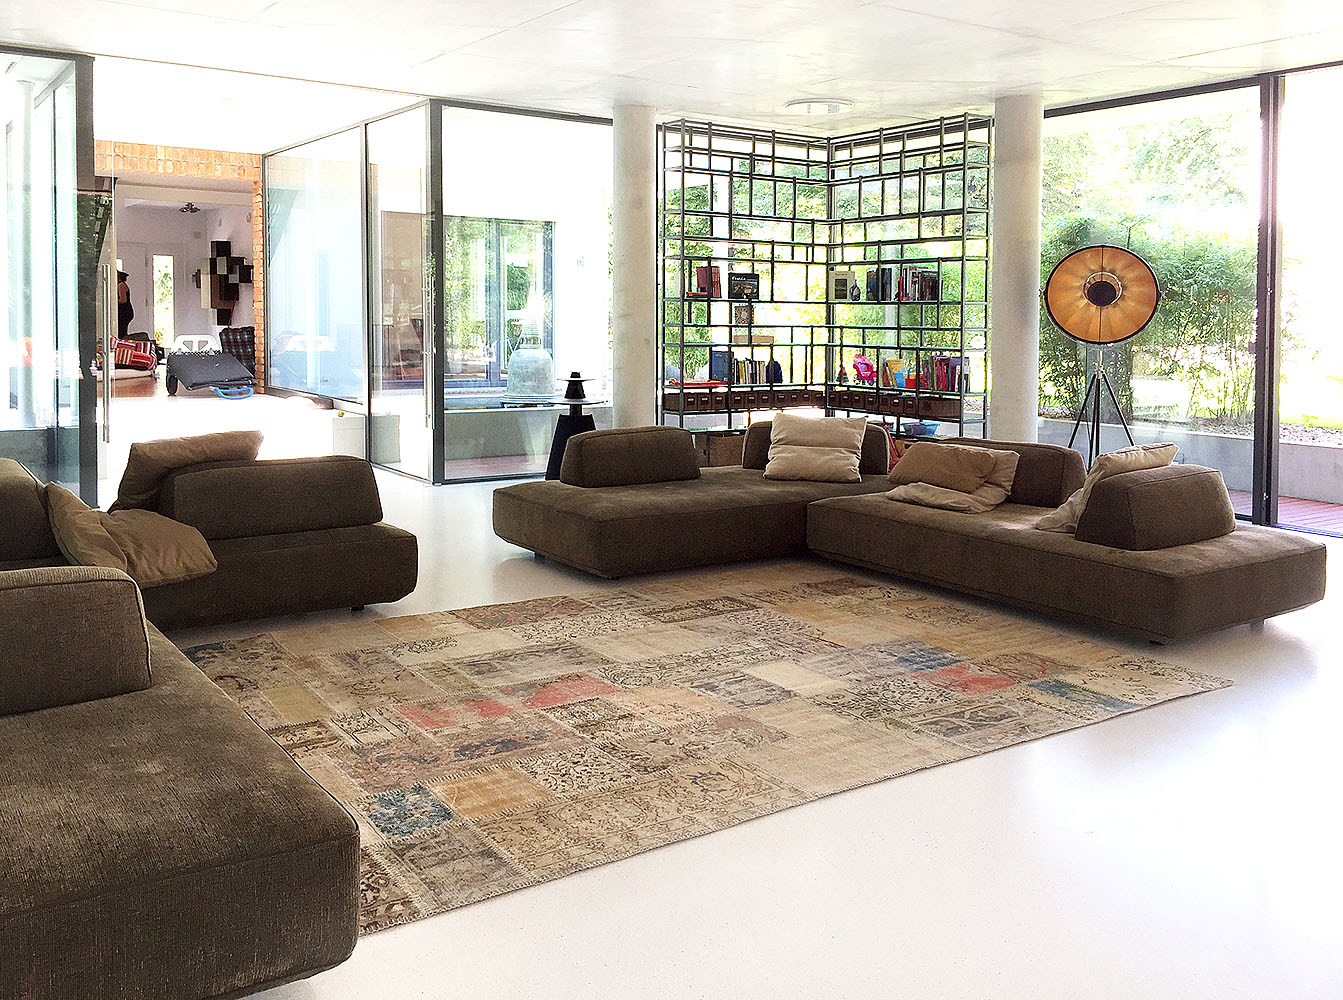 PW-beige-Sofa